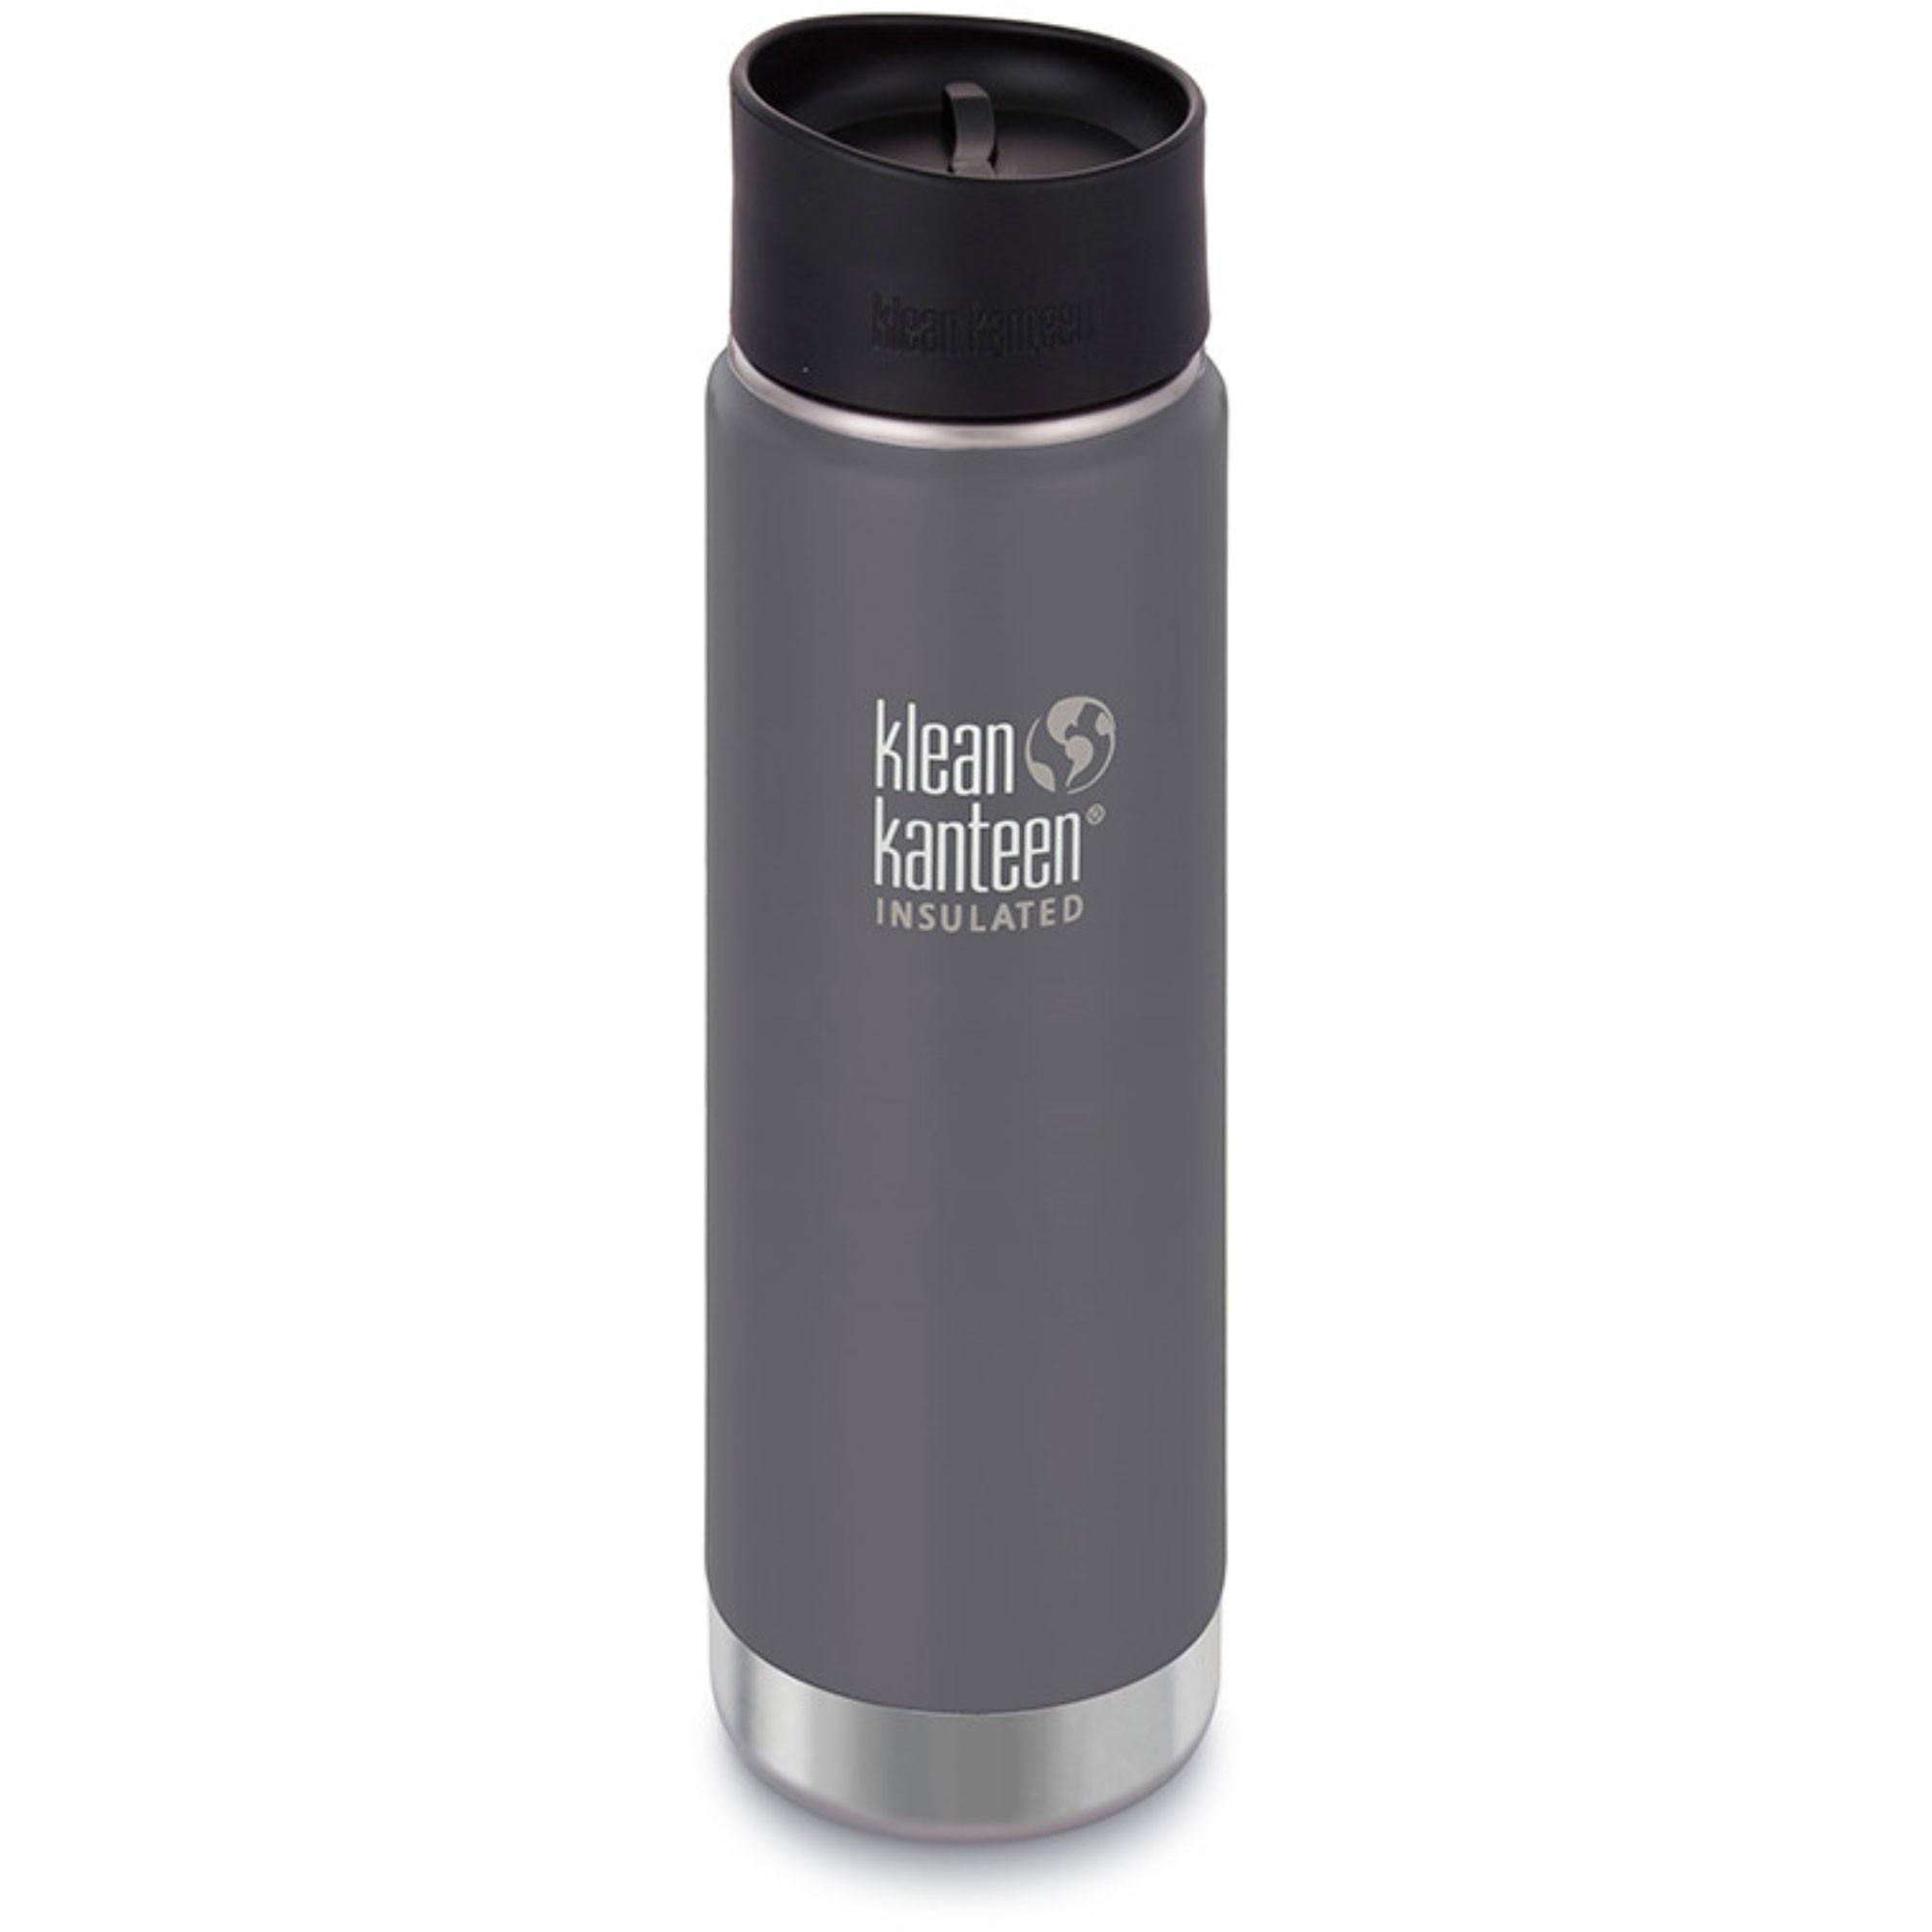 KLEAN KANTEEN - Insulated Cafe Cap Flask - 592ml - Granite Peak